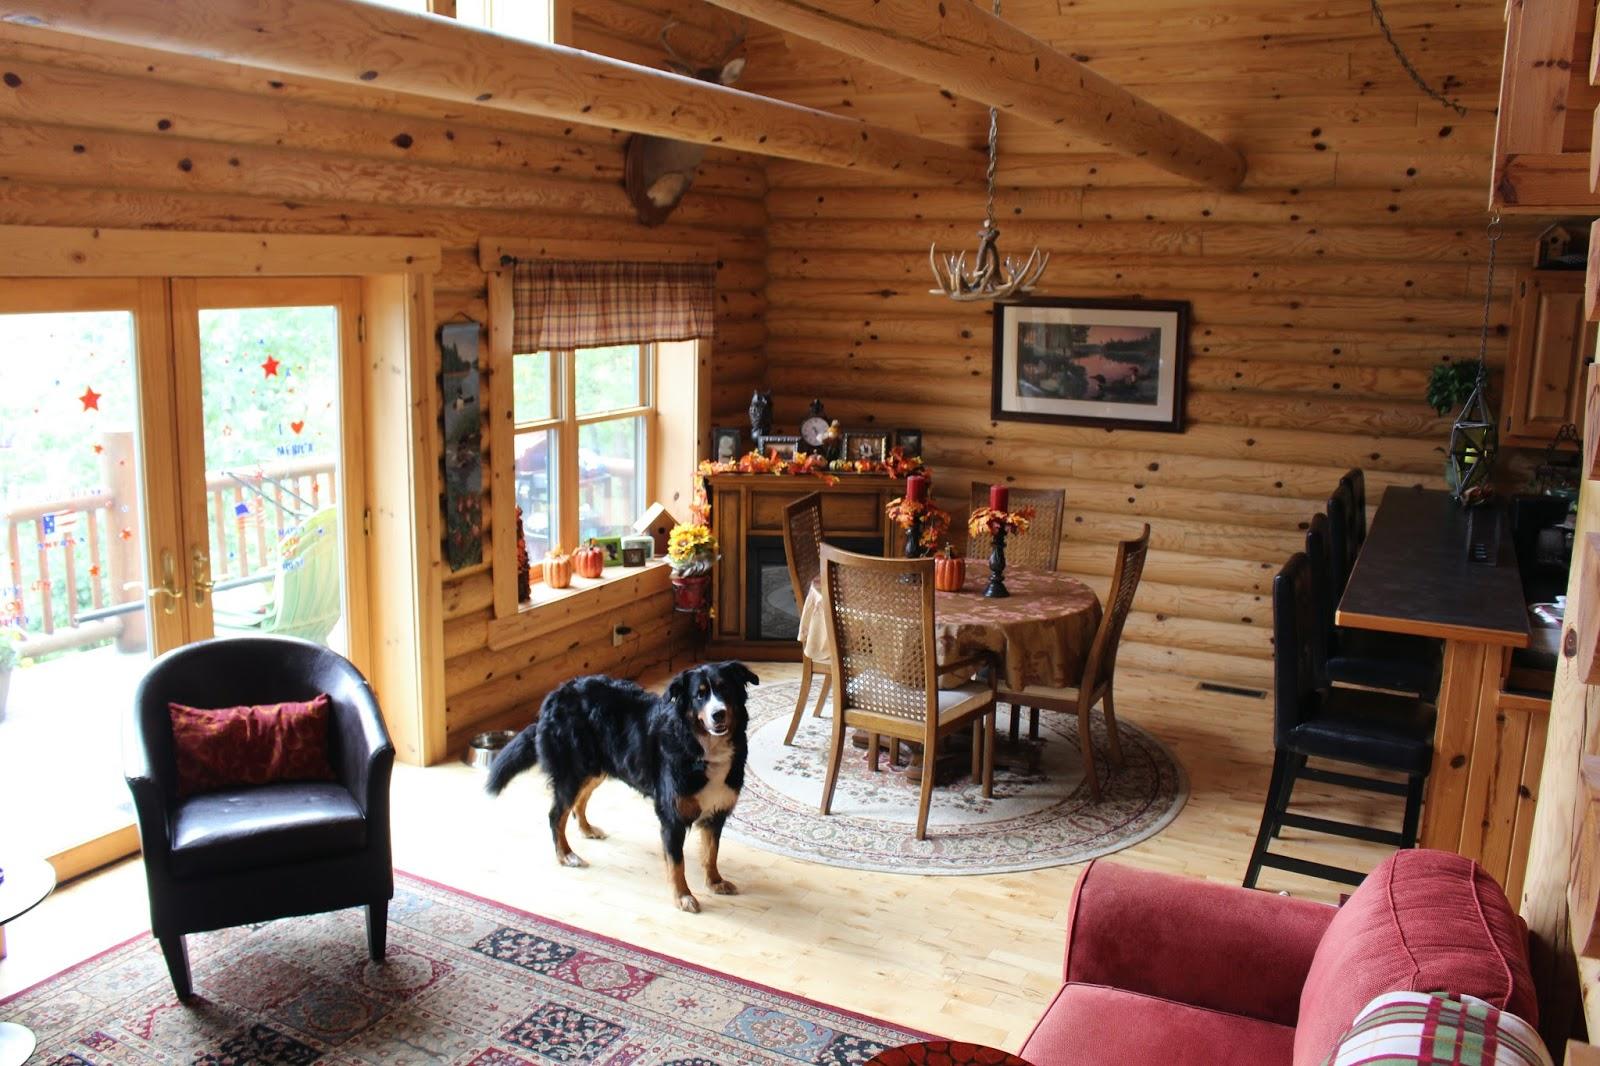 michigan cabin northern resort getaway grand lake vacation img rentals in lakeside cabins